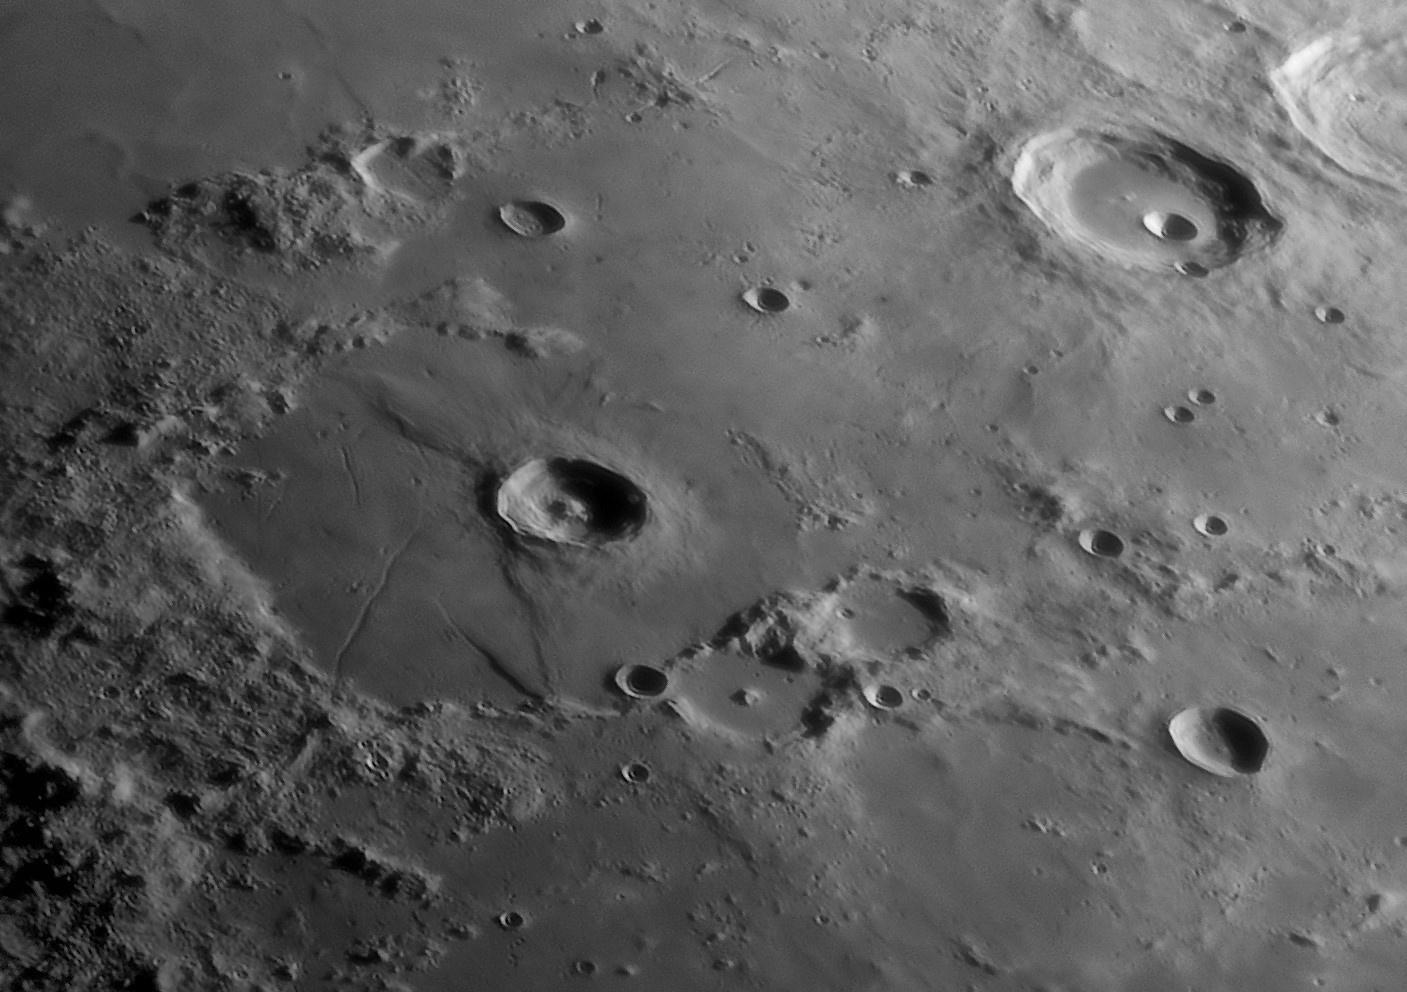 Lacus Mortis Burg Plana Mason Herkules 20190510_215233_g4_ap1605_conv pop.jpg